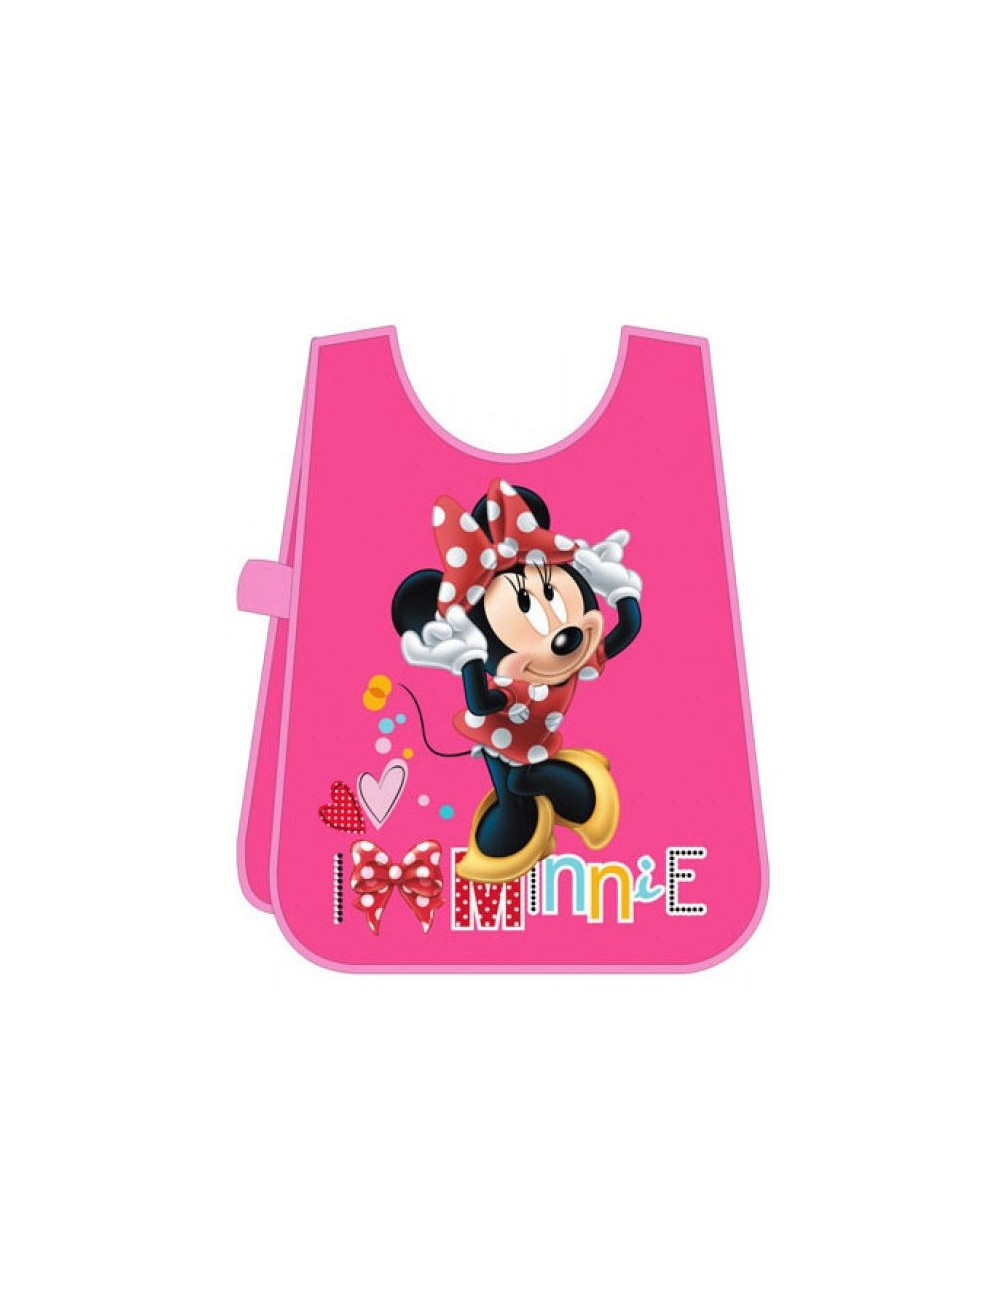 Sort protectie PVC Minnie Mouse